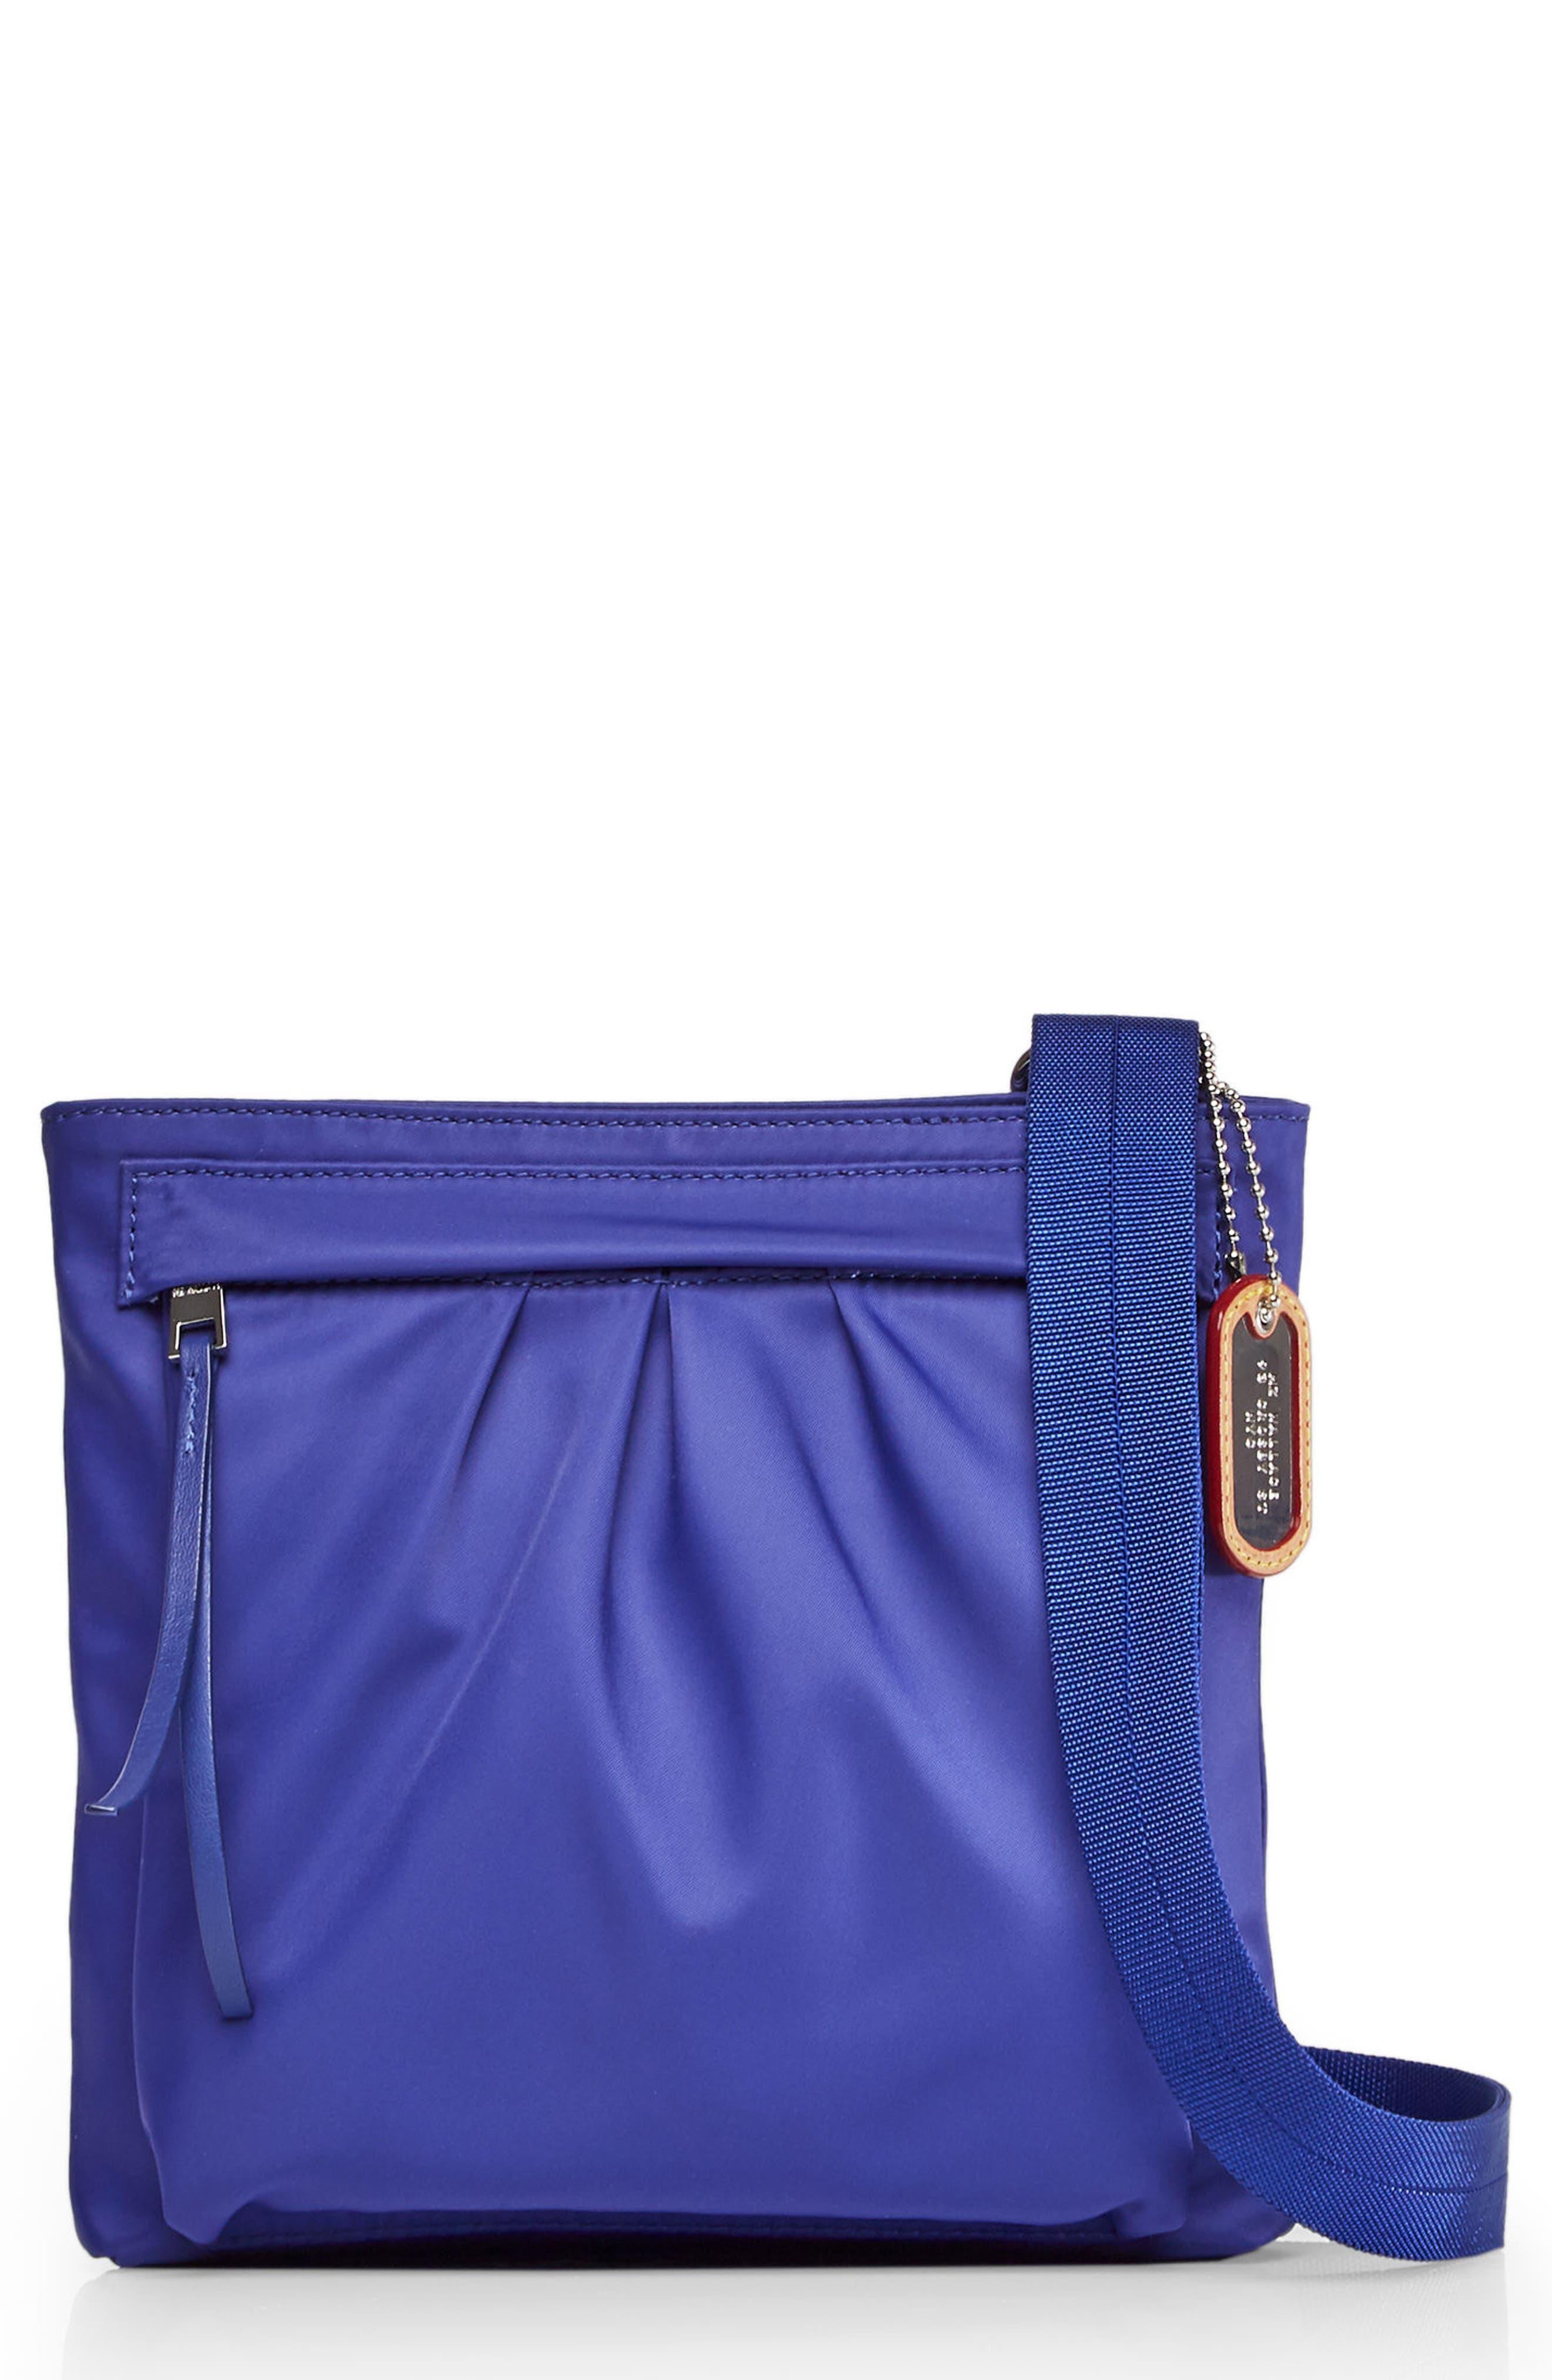 Jordan Bedford Nylon Crossbody Bag,                             Main thumbnail 1, color,                             Spectrum Blue